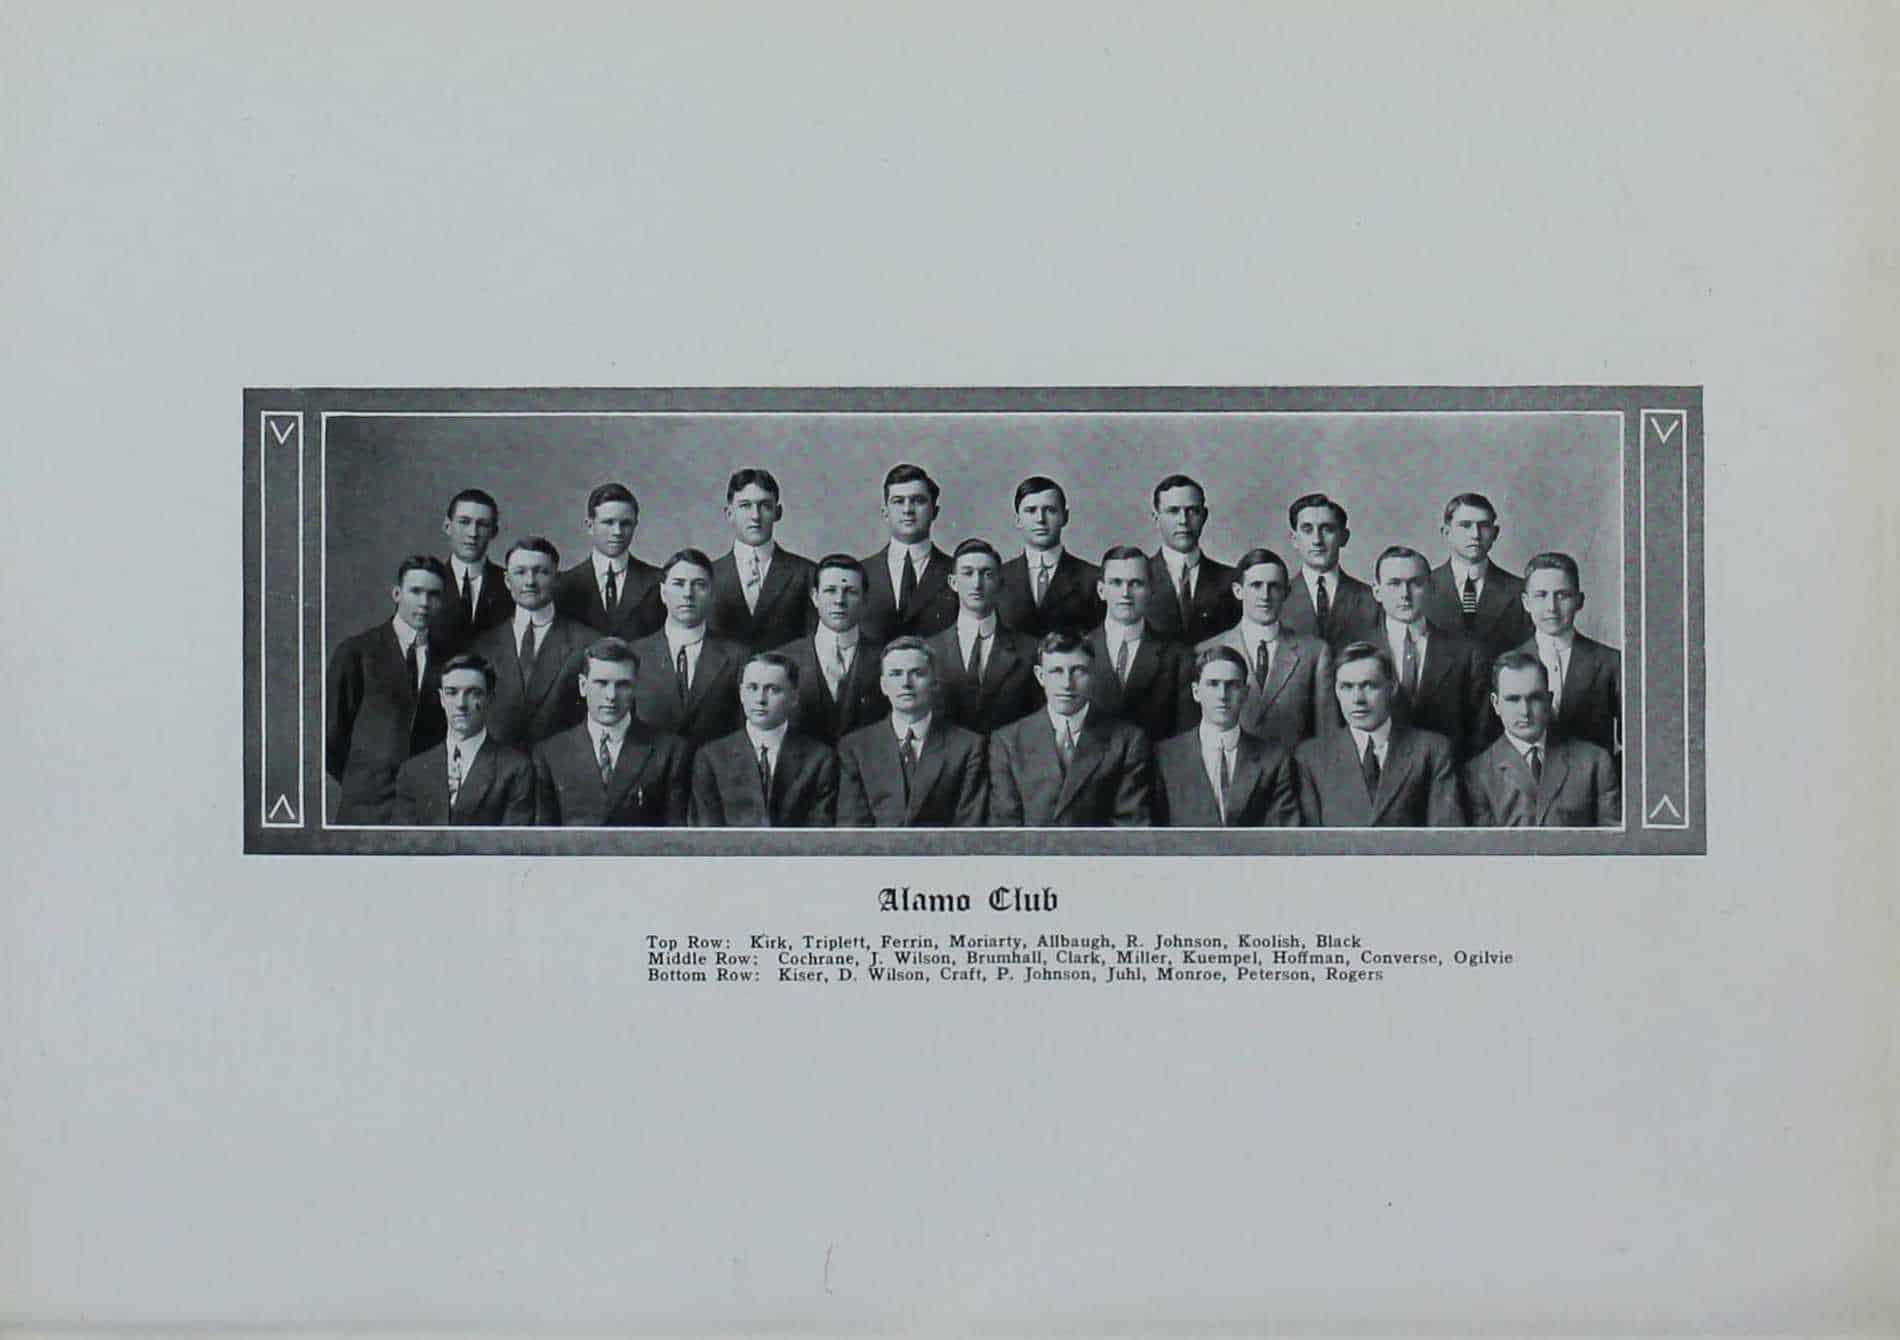 1912 Alamo Club